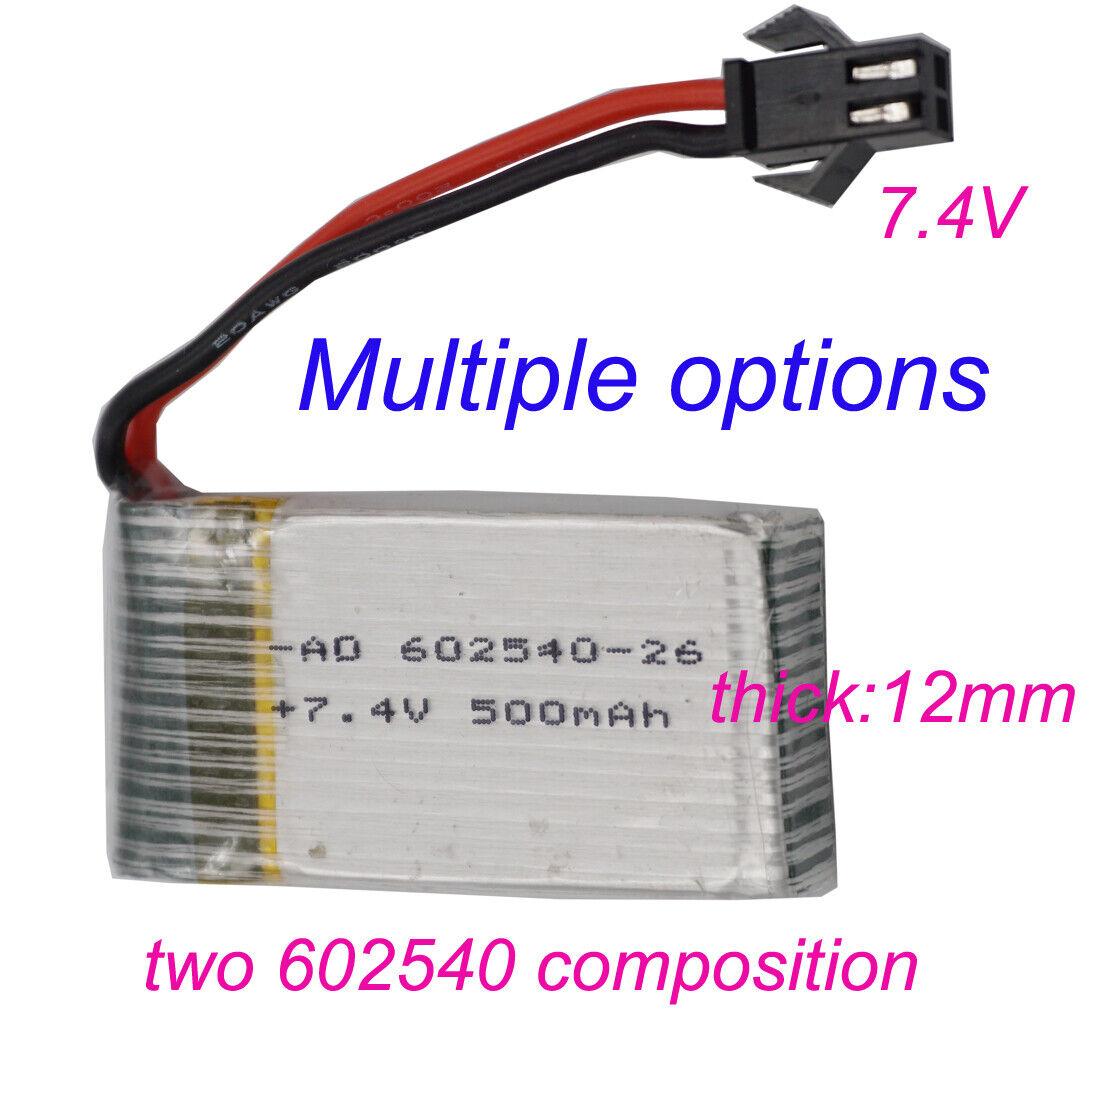 7.4V 500mAh 25C Polymer Li-Po battery 602540 for JJRC H11C H11D RC FPV RC Drone